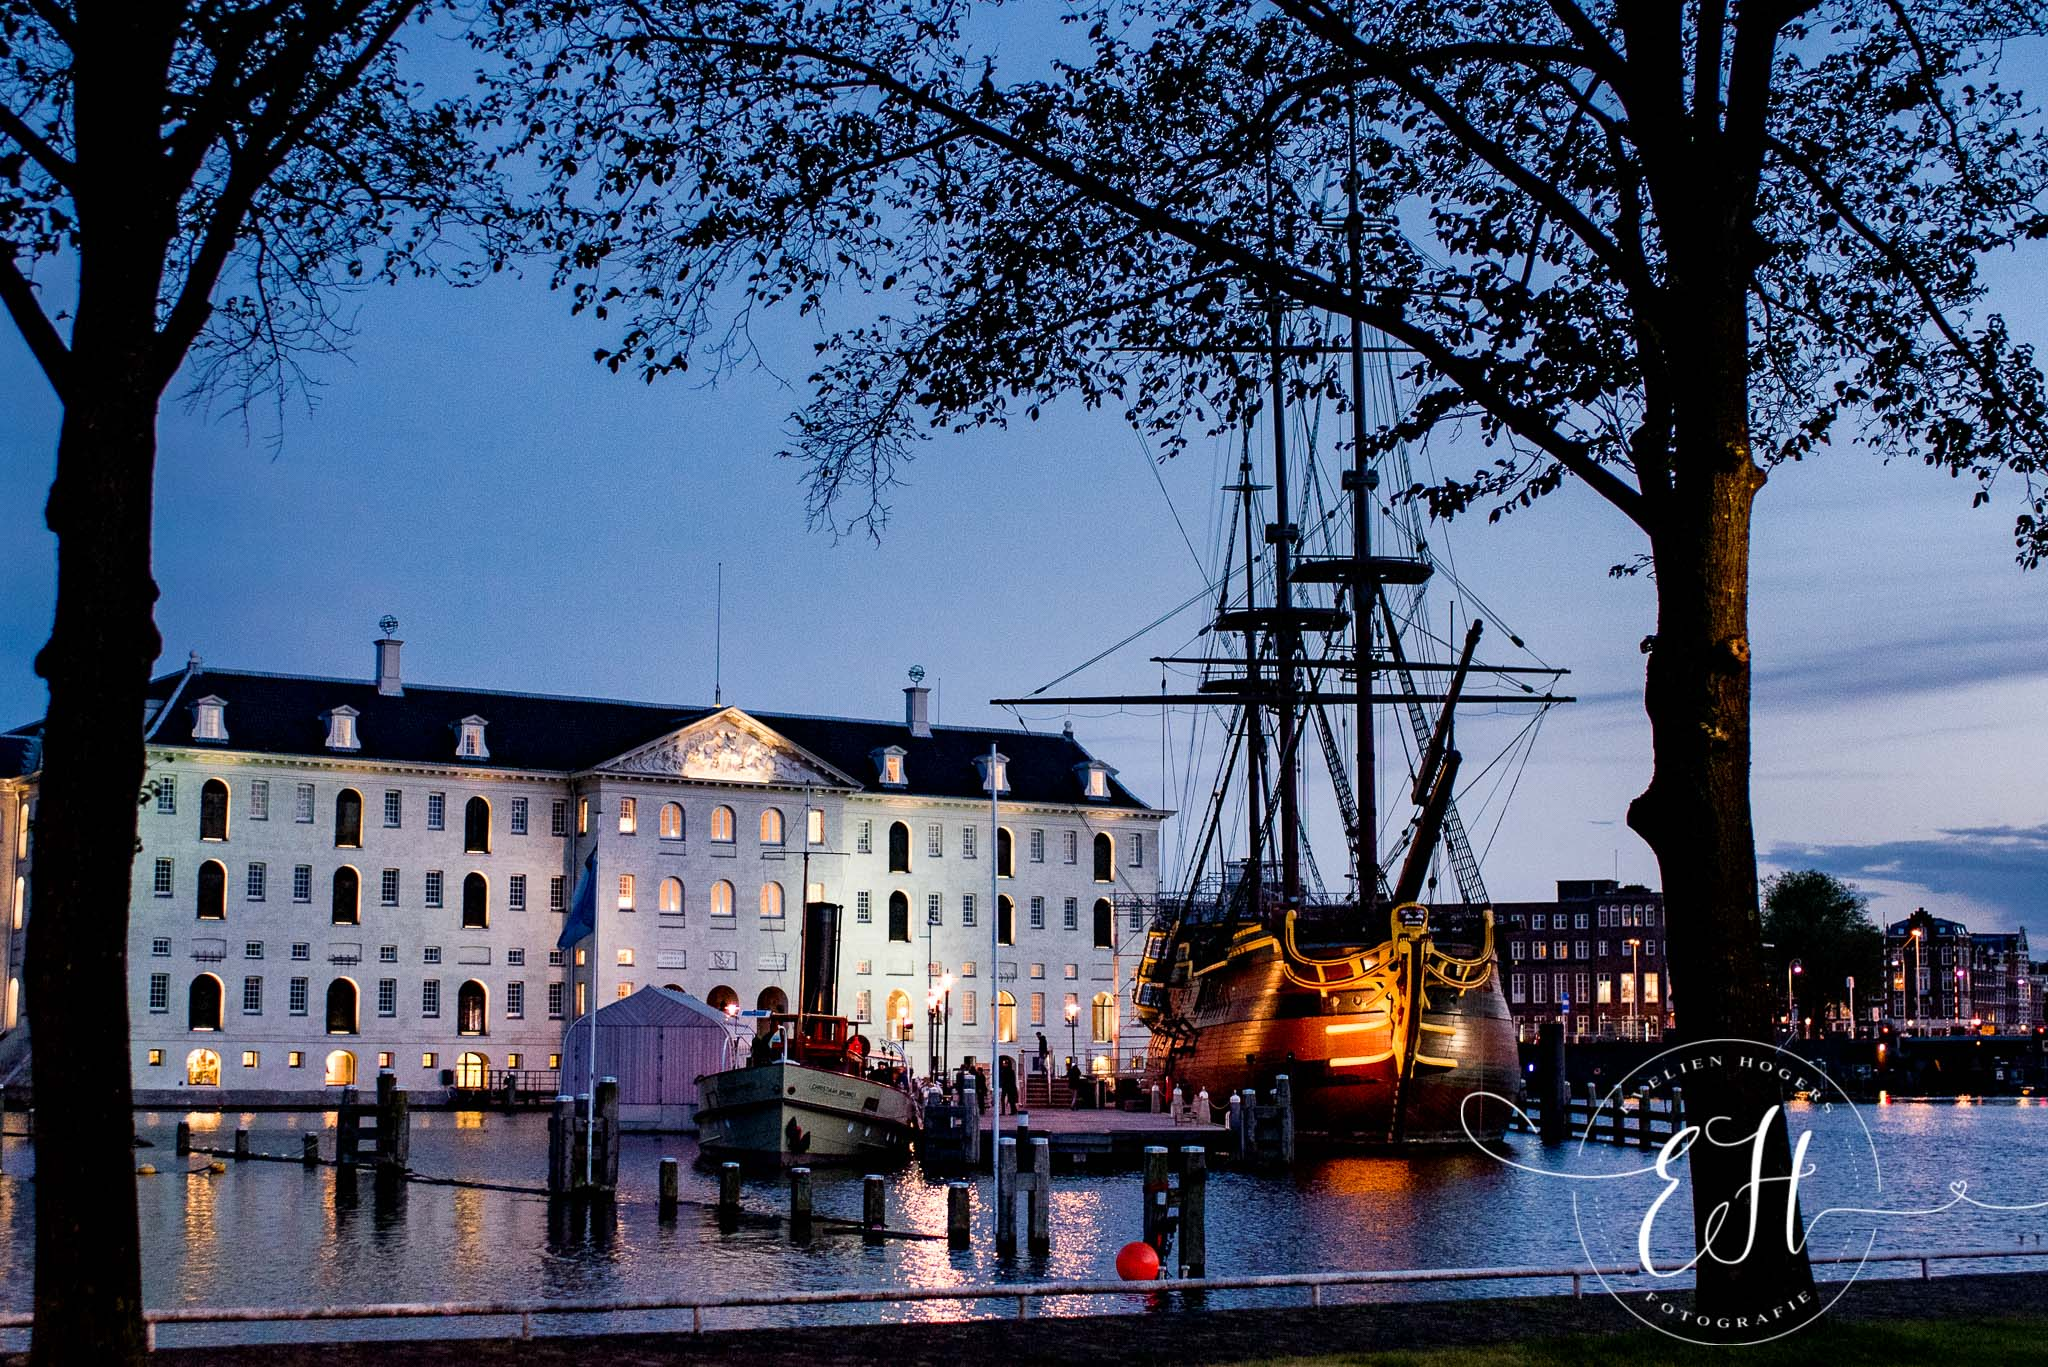 loveshoot-in-amsterdam-evelien-hogers-fotografie (22 van 26).jpg